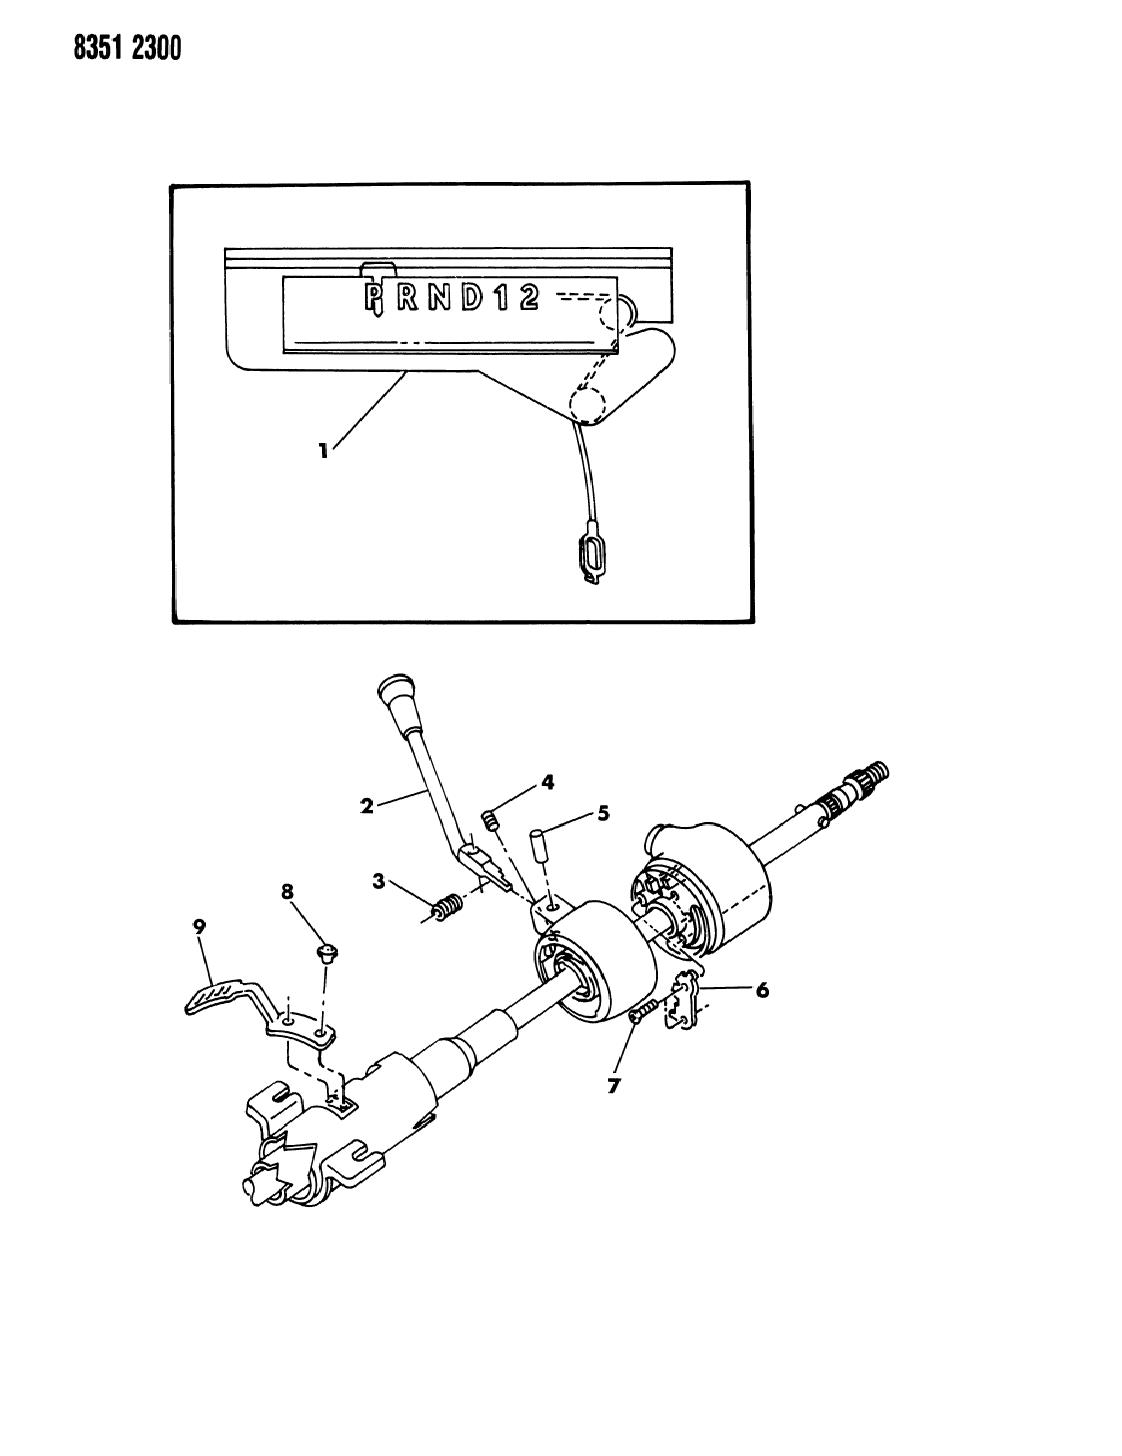 1989 dodge dakota controls, gearshift, steering column shift